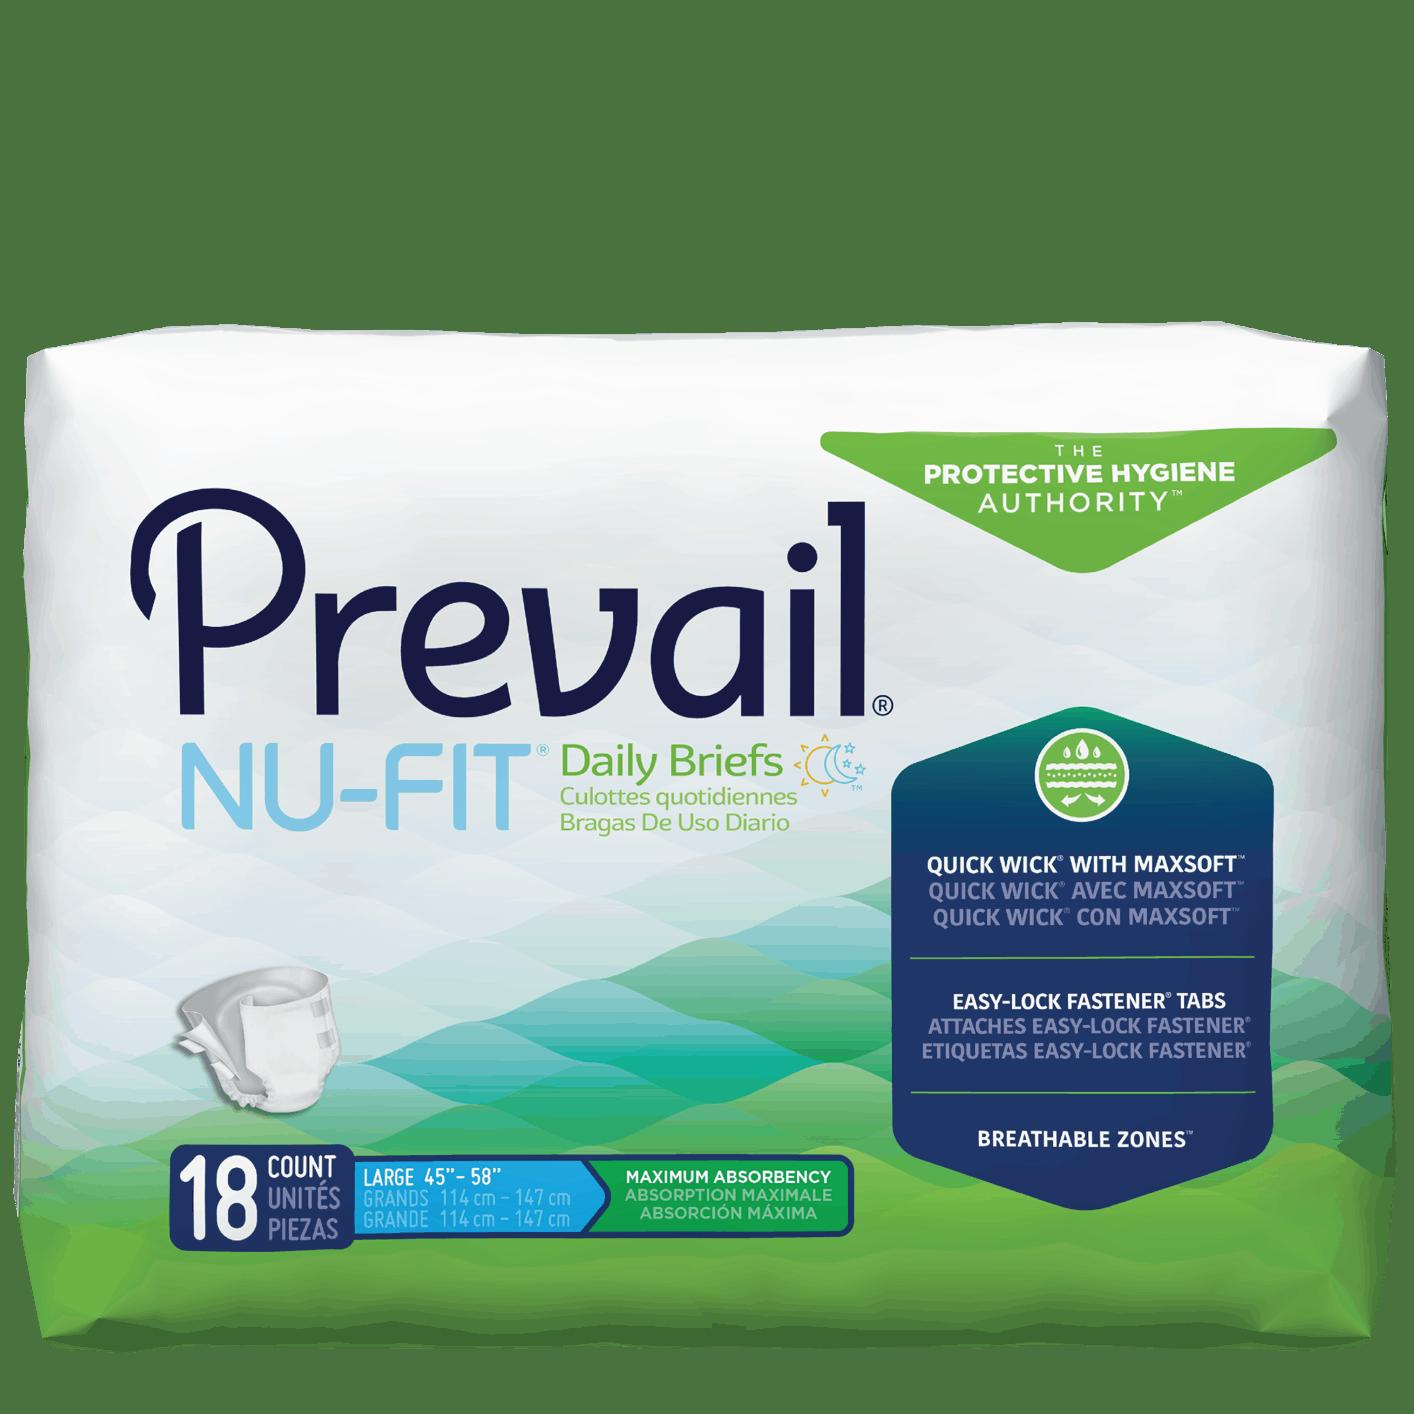 Prevail NU-FIT Adult Briefs Maximum Absorbency underwear